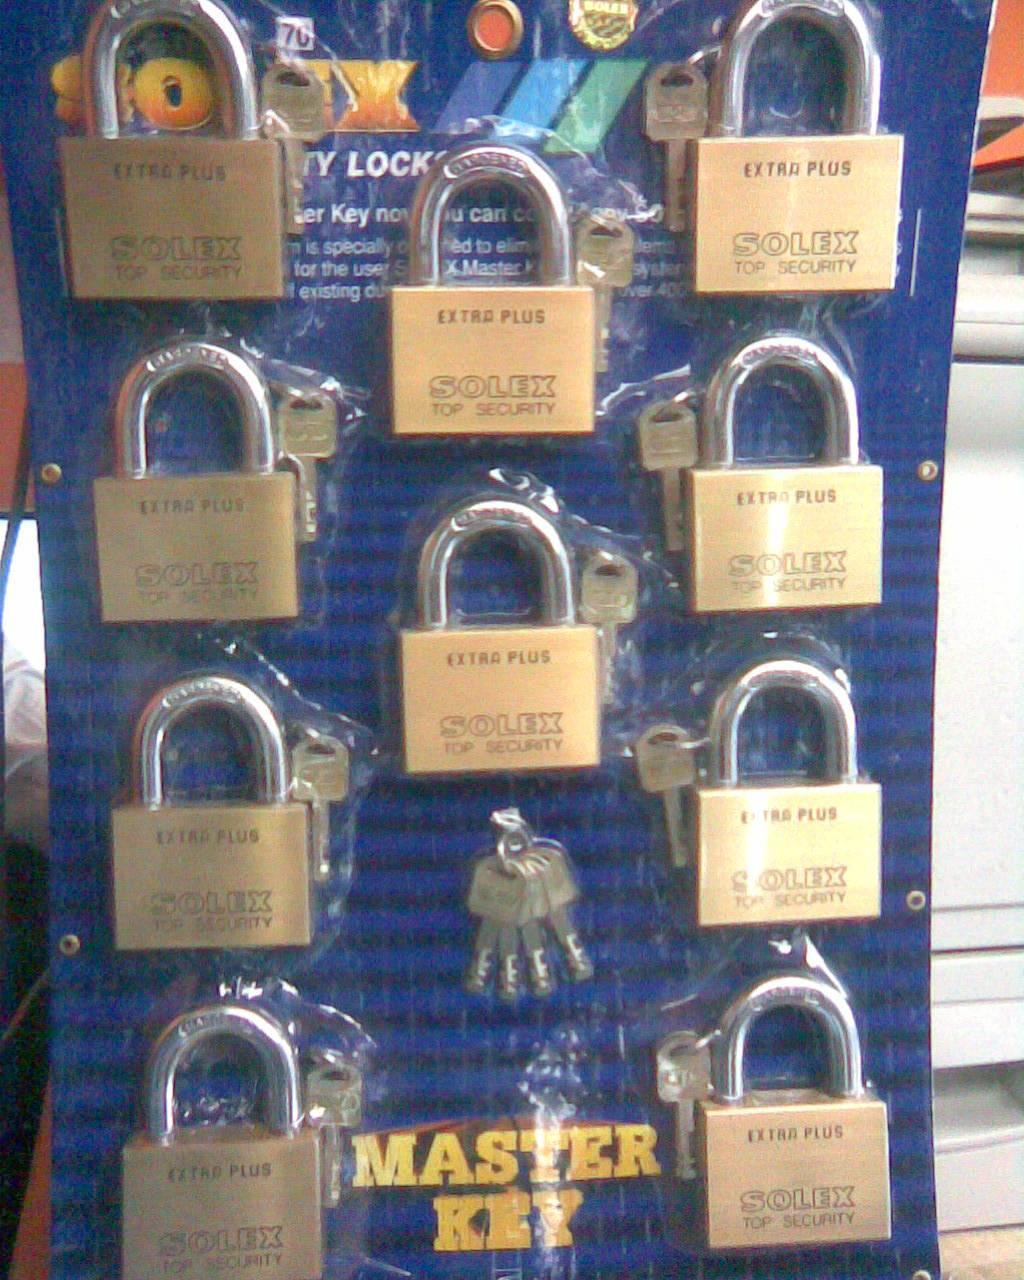 SOLEX TOP SECURITY PADLOCK DUBAI, PAD LOCK DUBAI - AMB COMPUTERS